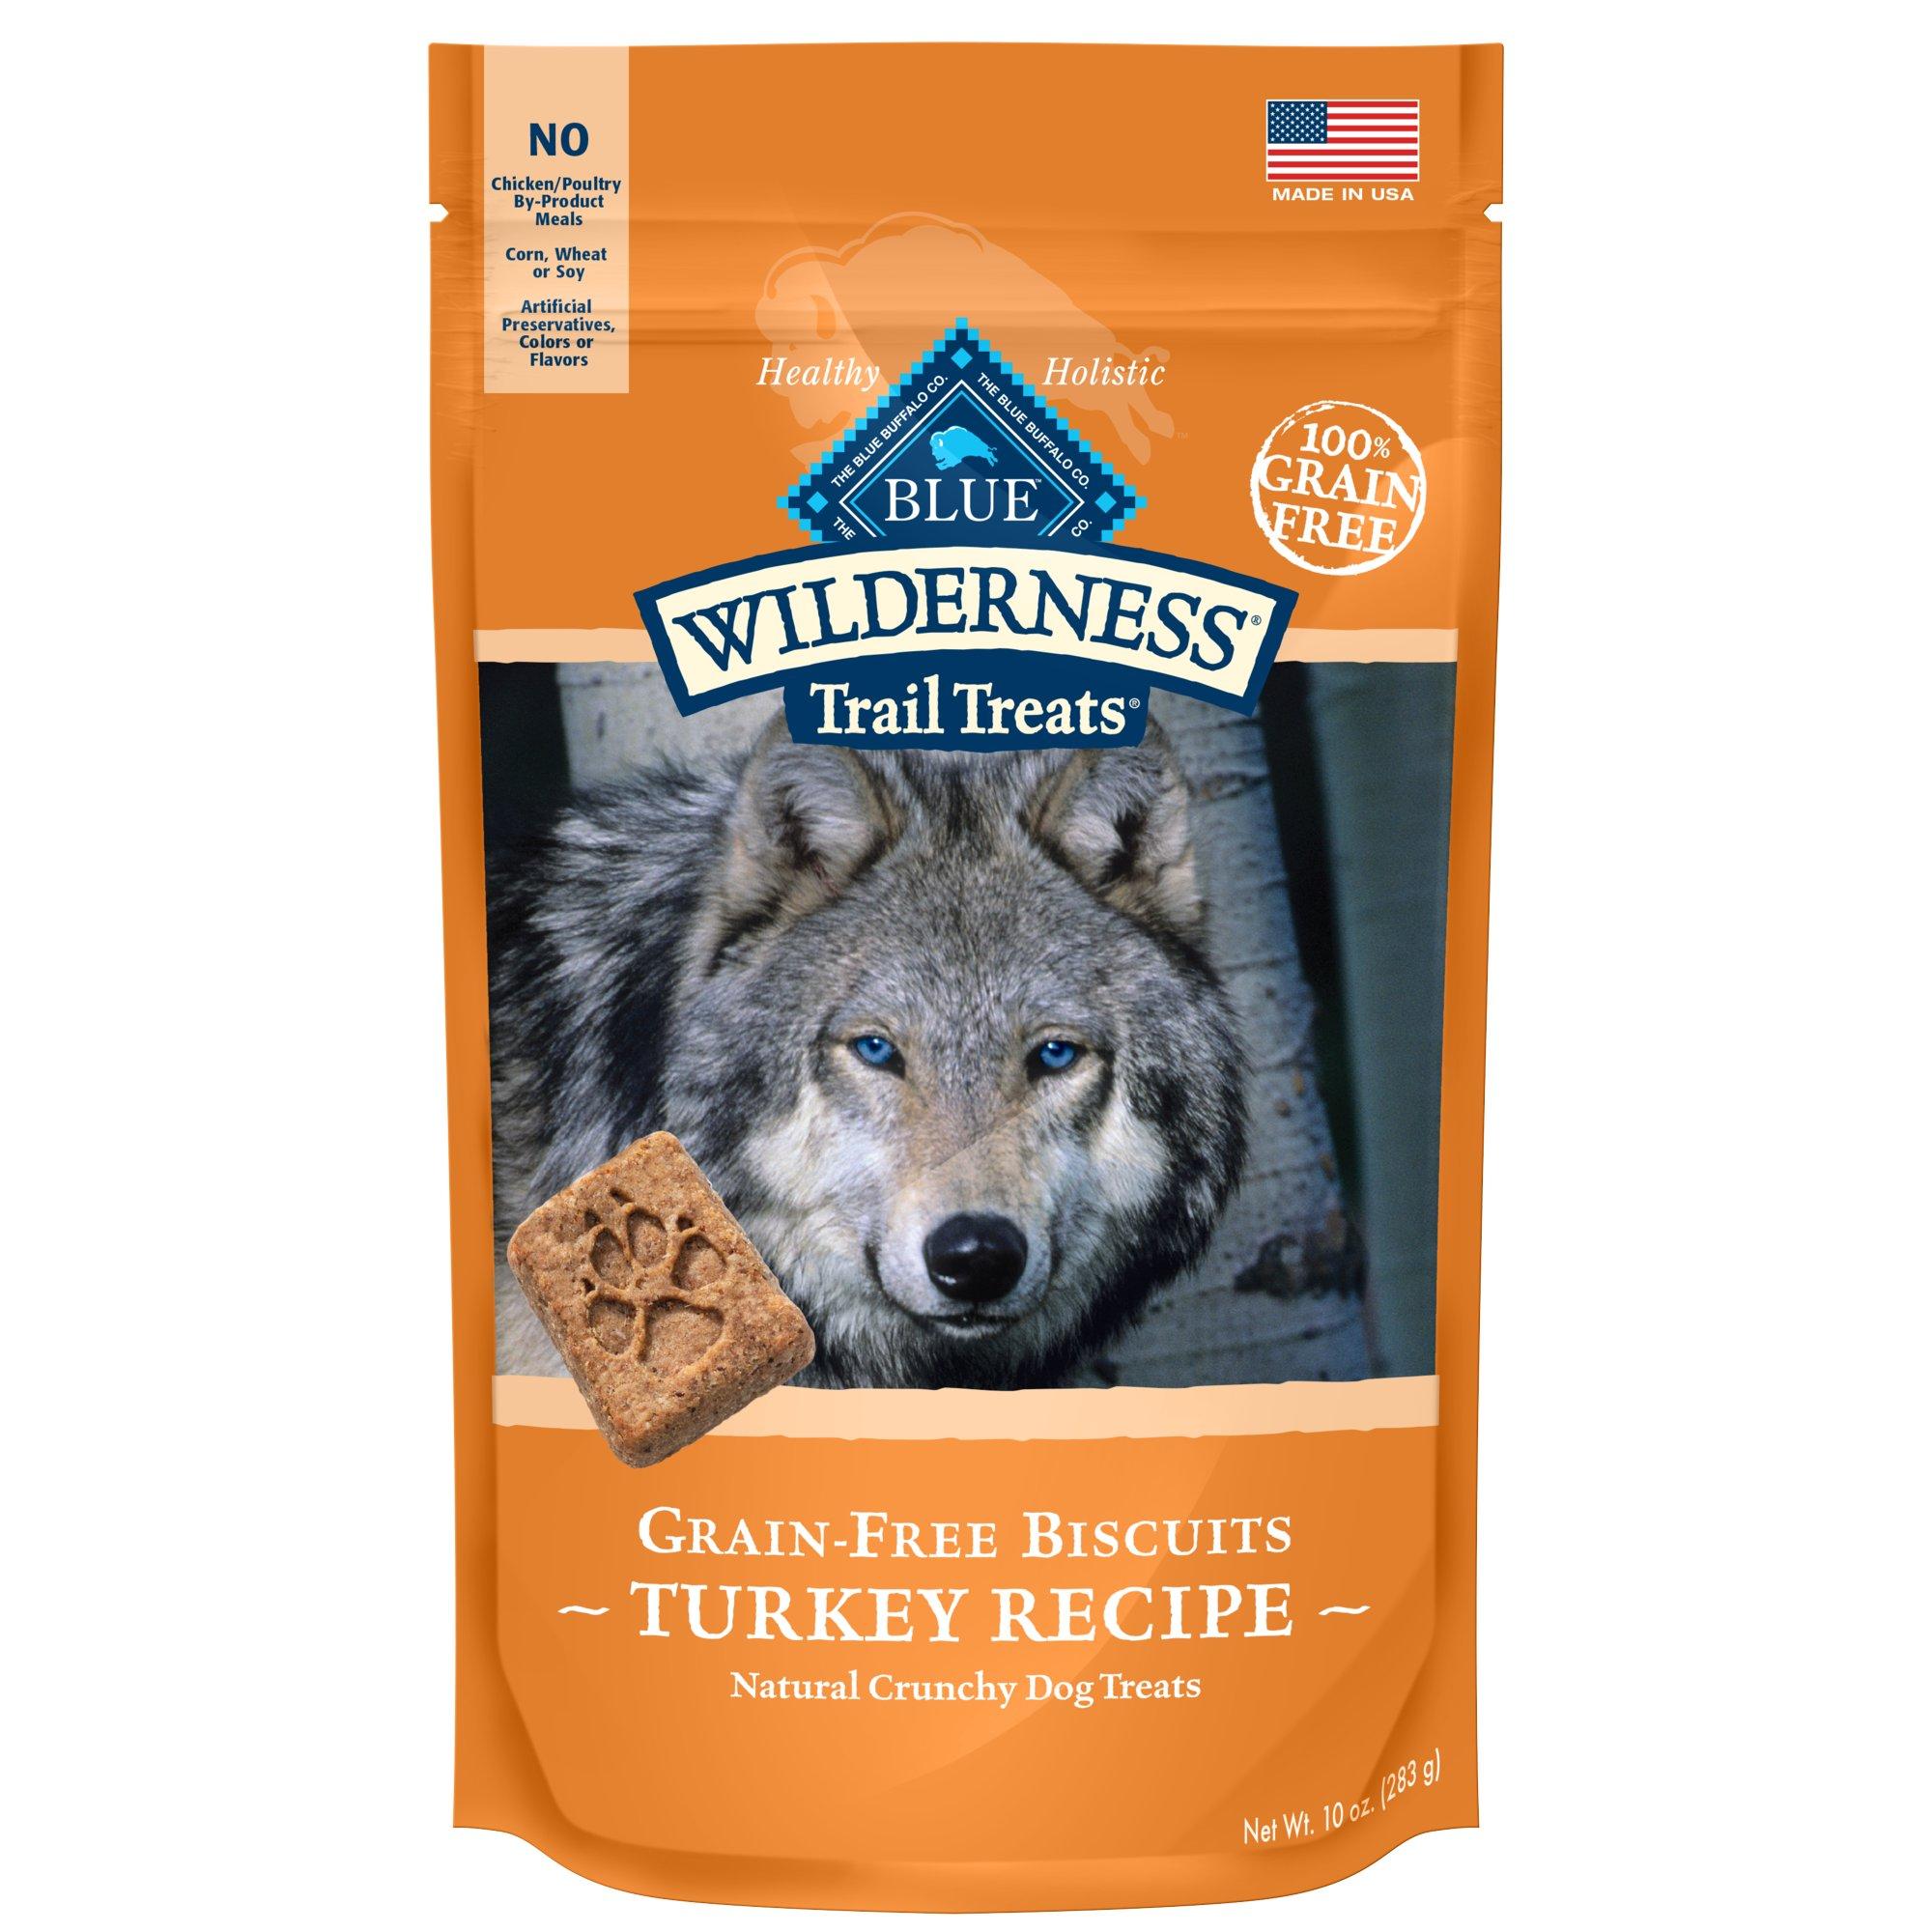 Blue Buffalo Wilderness Trail Treats Grain-Free Turkey Dog Biscuits